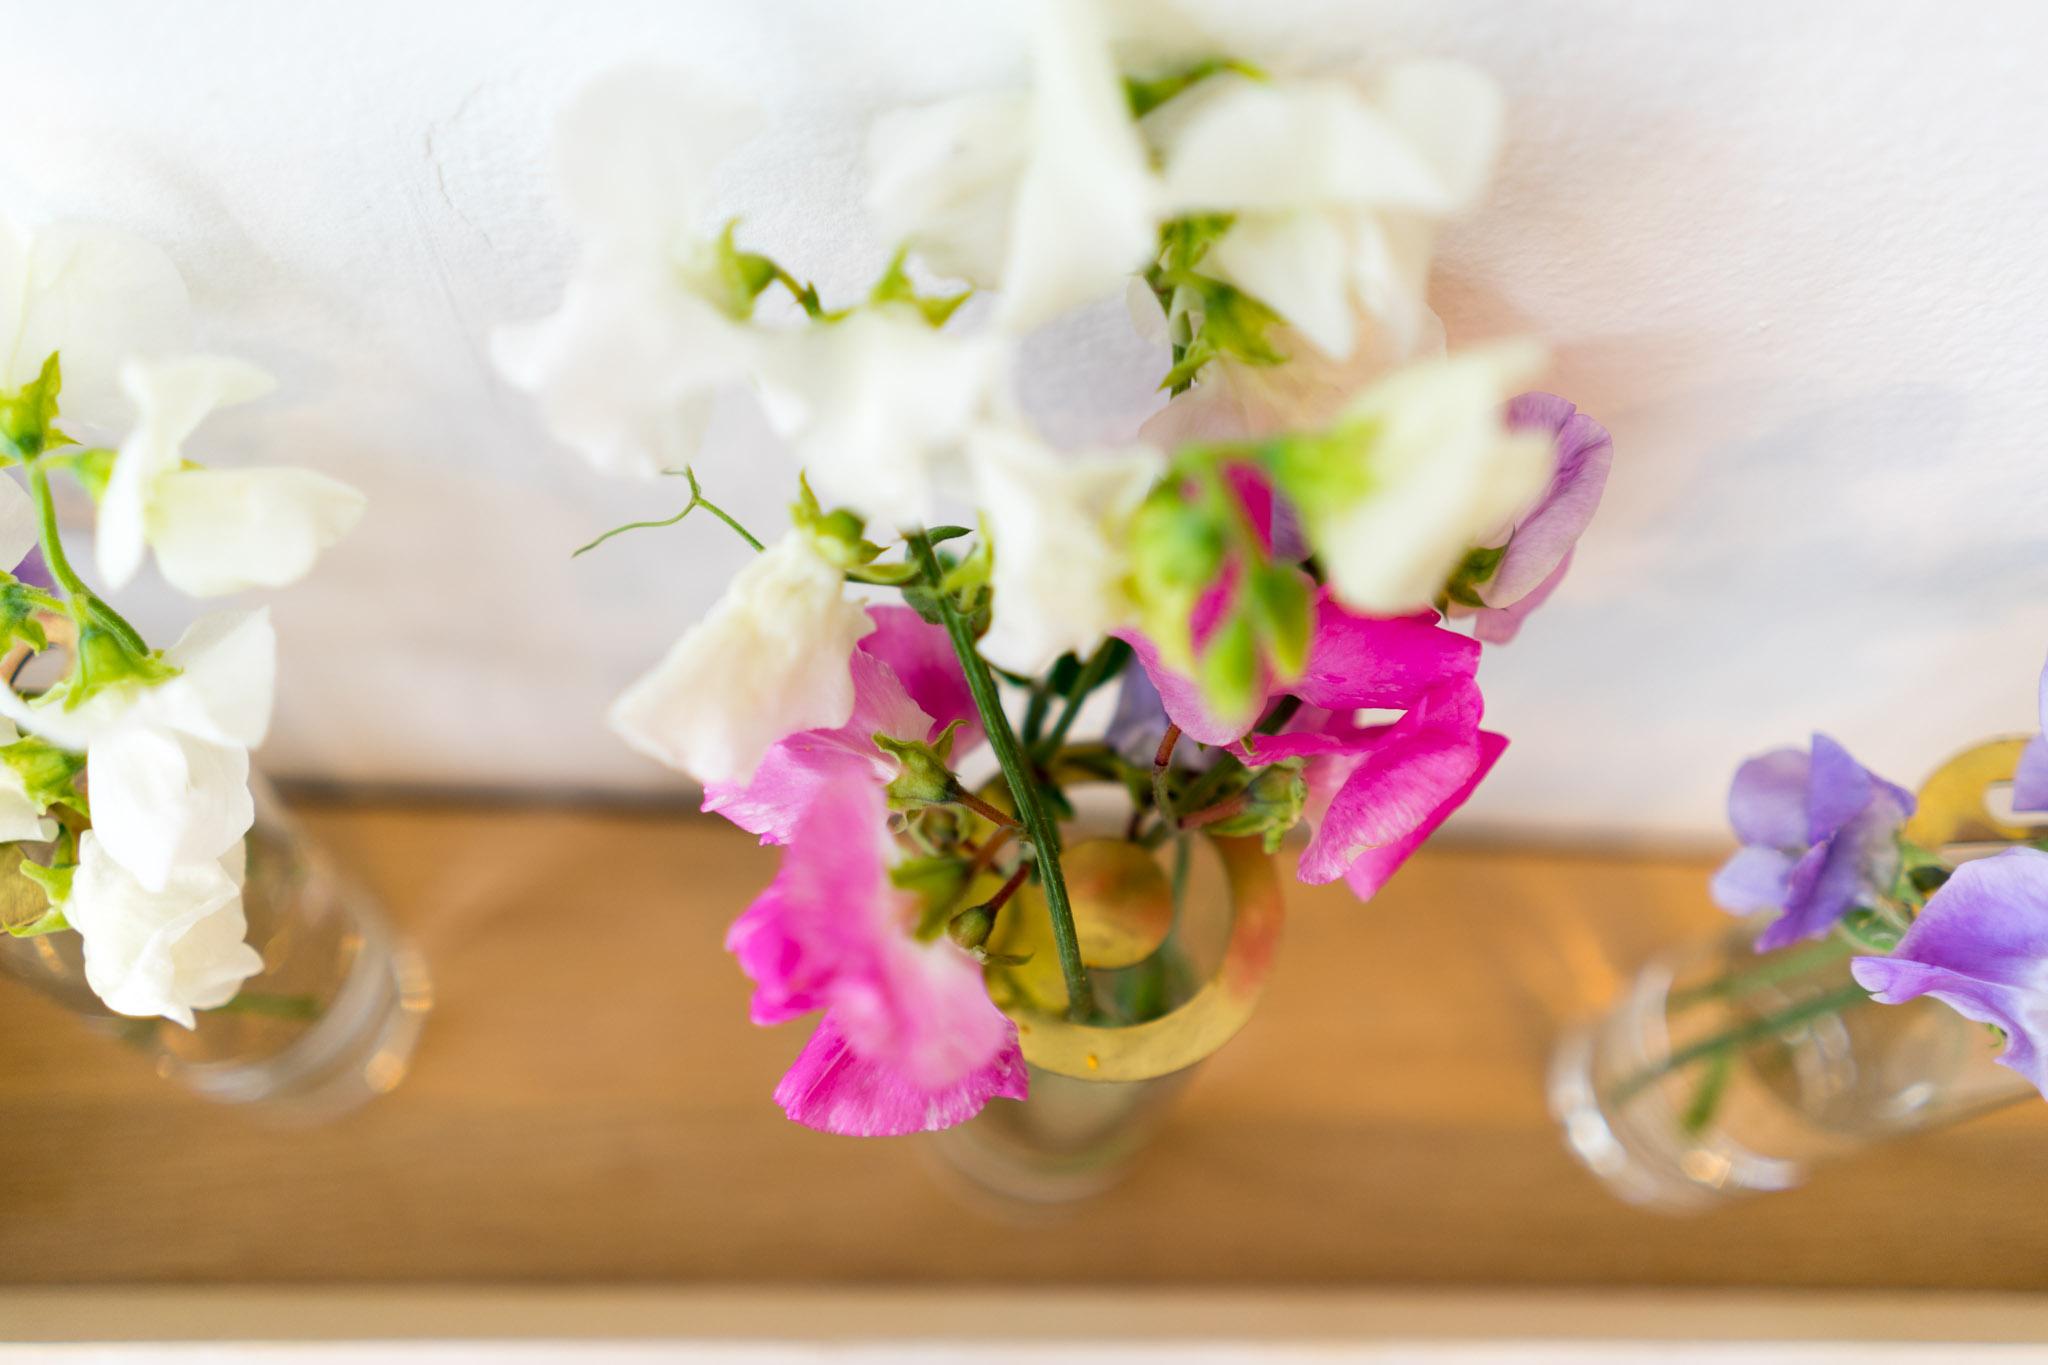 Blume Whistle-01193.jpg